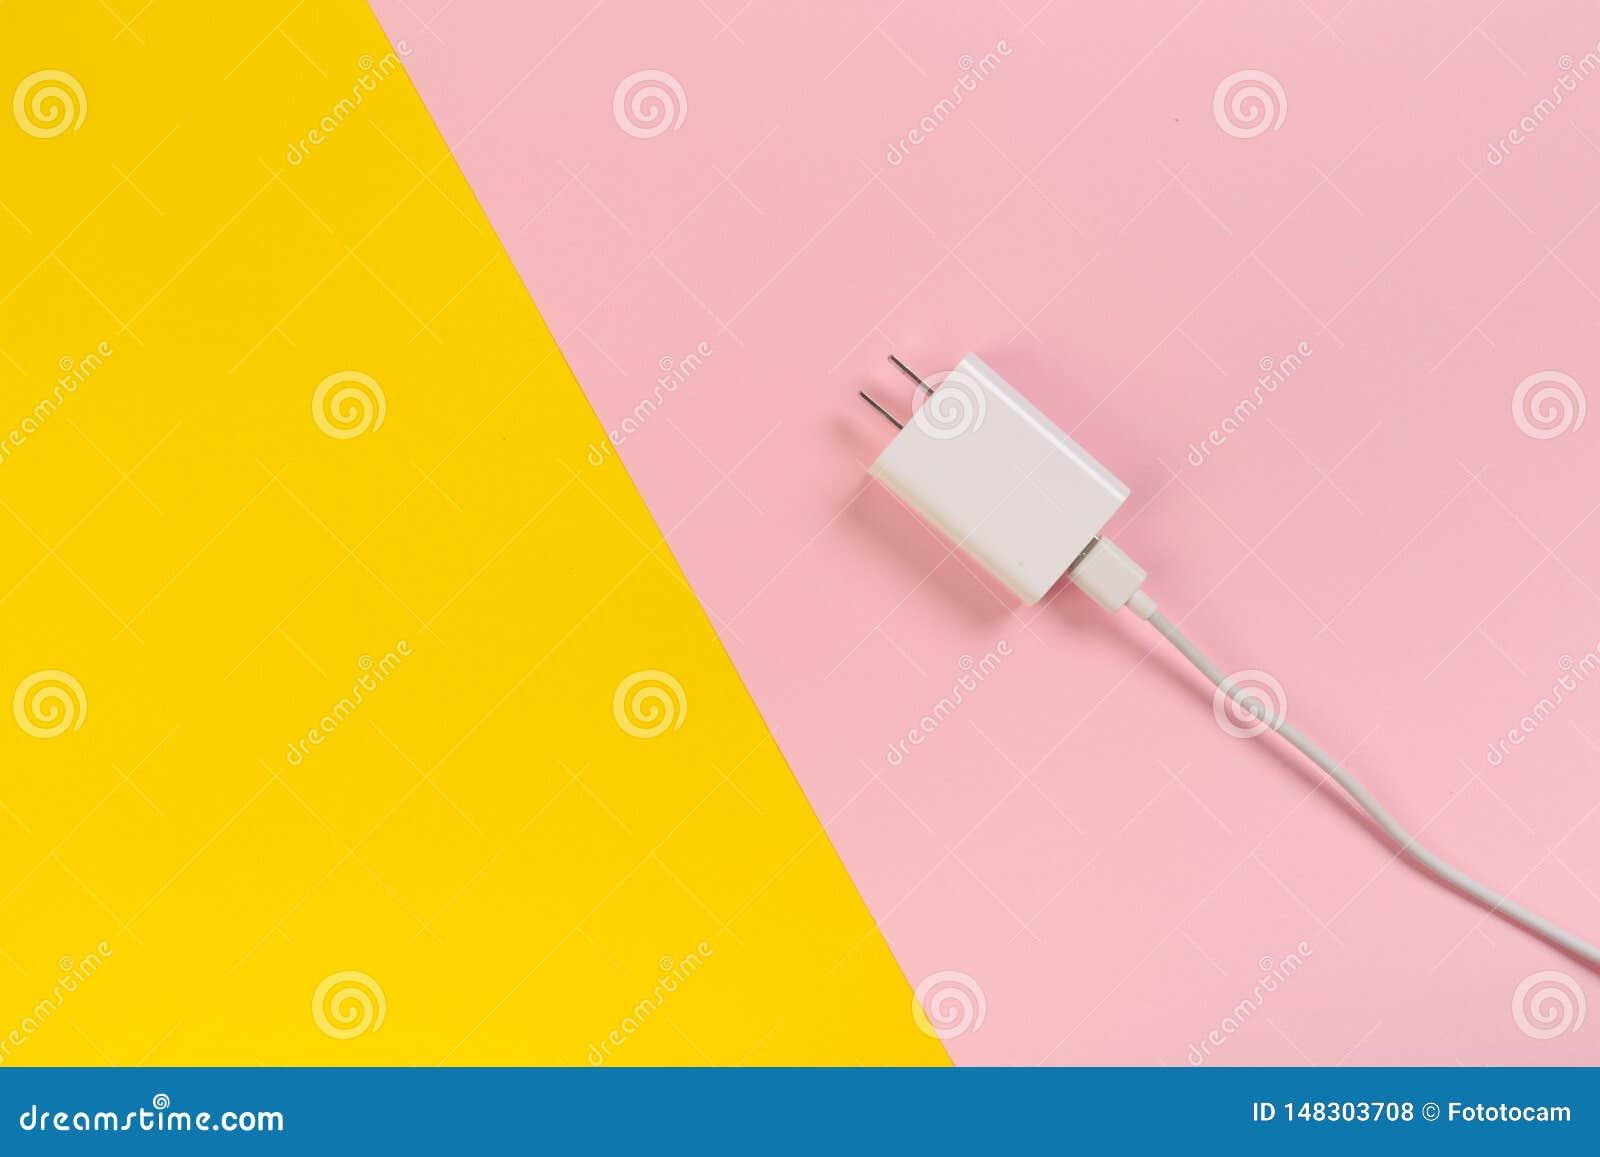 Fundo da cor pastel do ob dos cabos de USB micro Conectores e soquetes para o PC e dispositivos m?veis - imagem